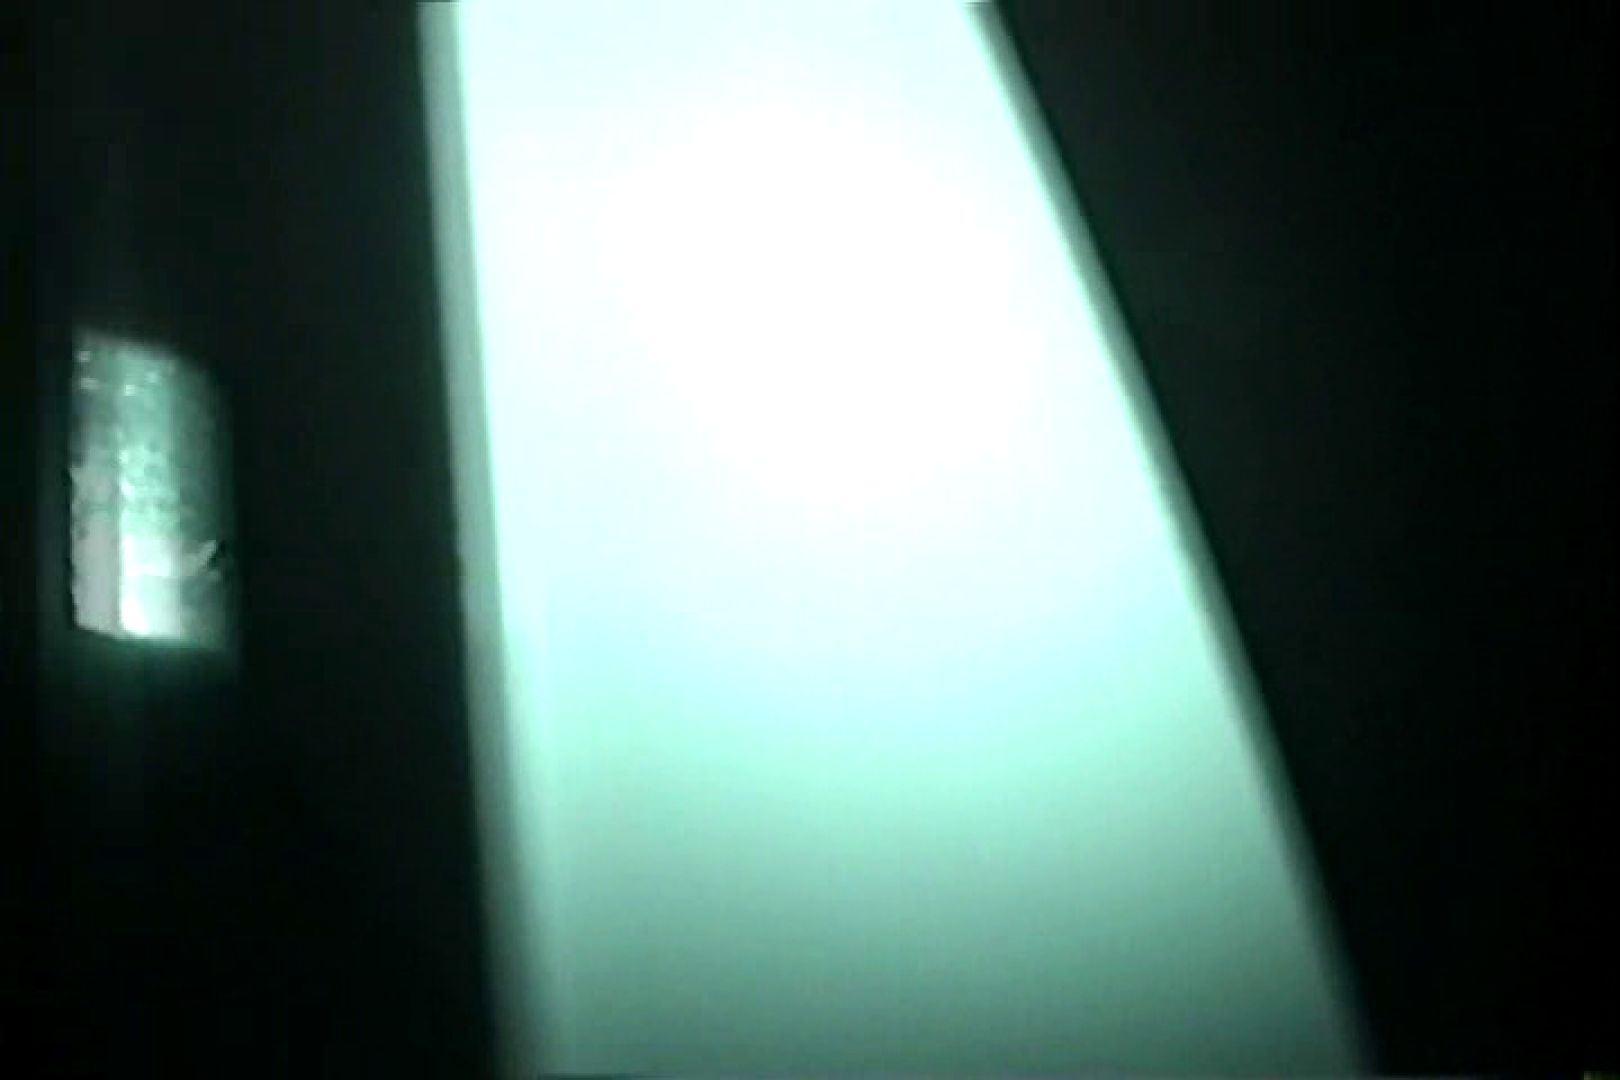 充血監督の深夜の運動会Vol.124 赤外線 オメコ無修正動画無料 97画像 83